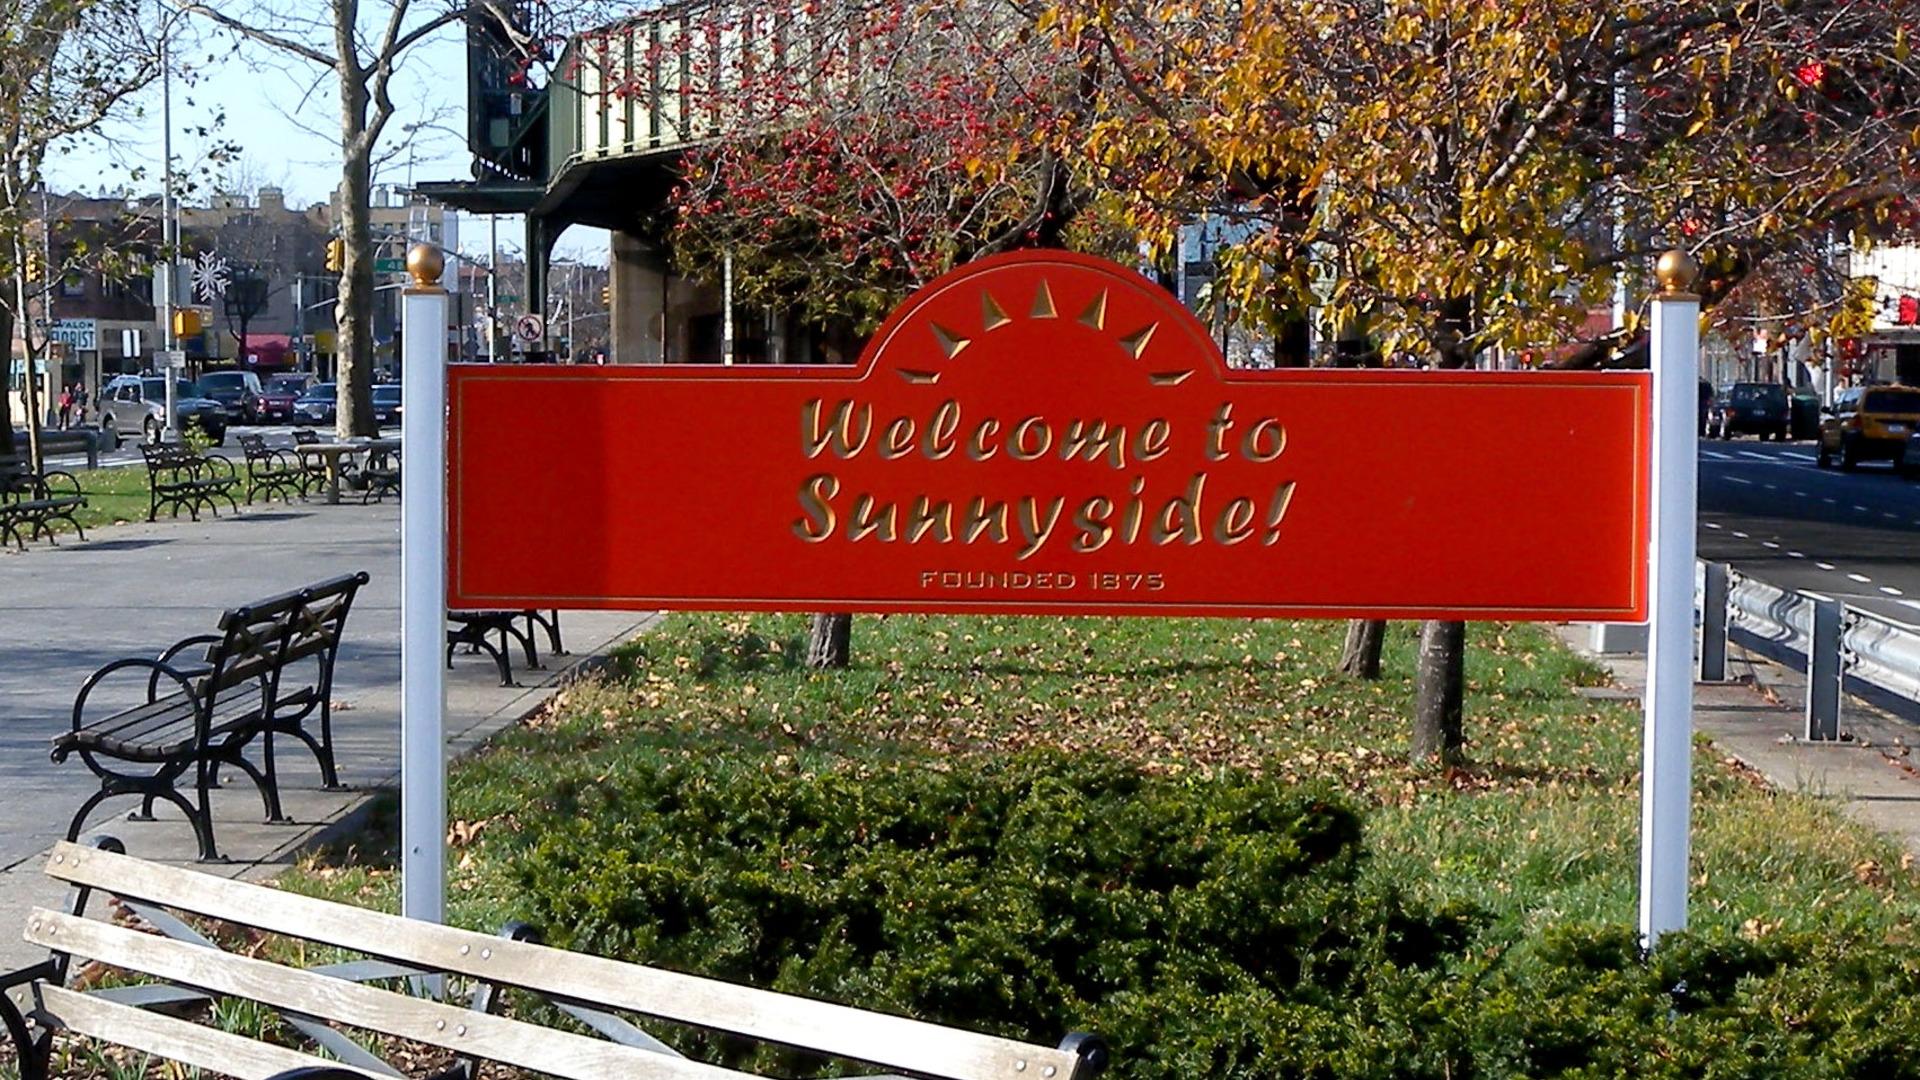 Sunnyside welcome jeh